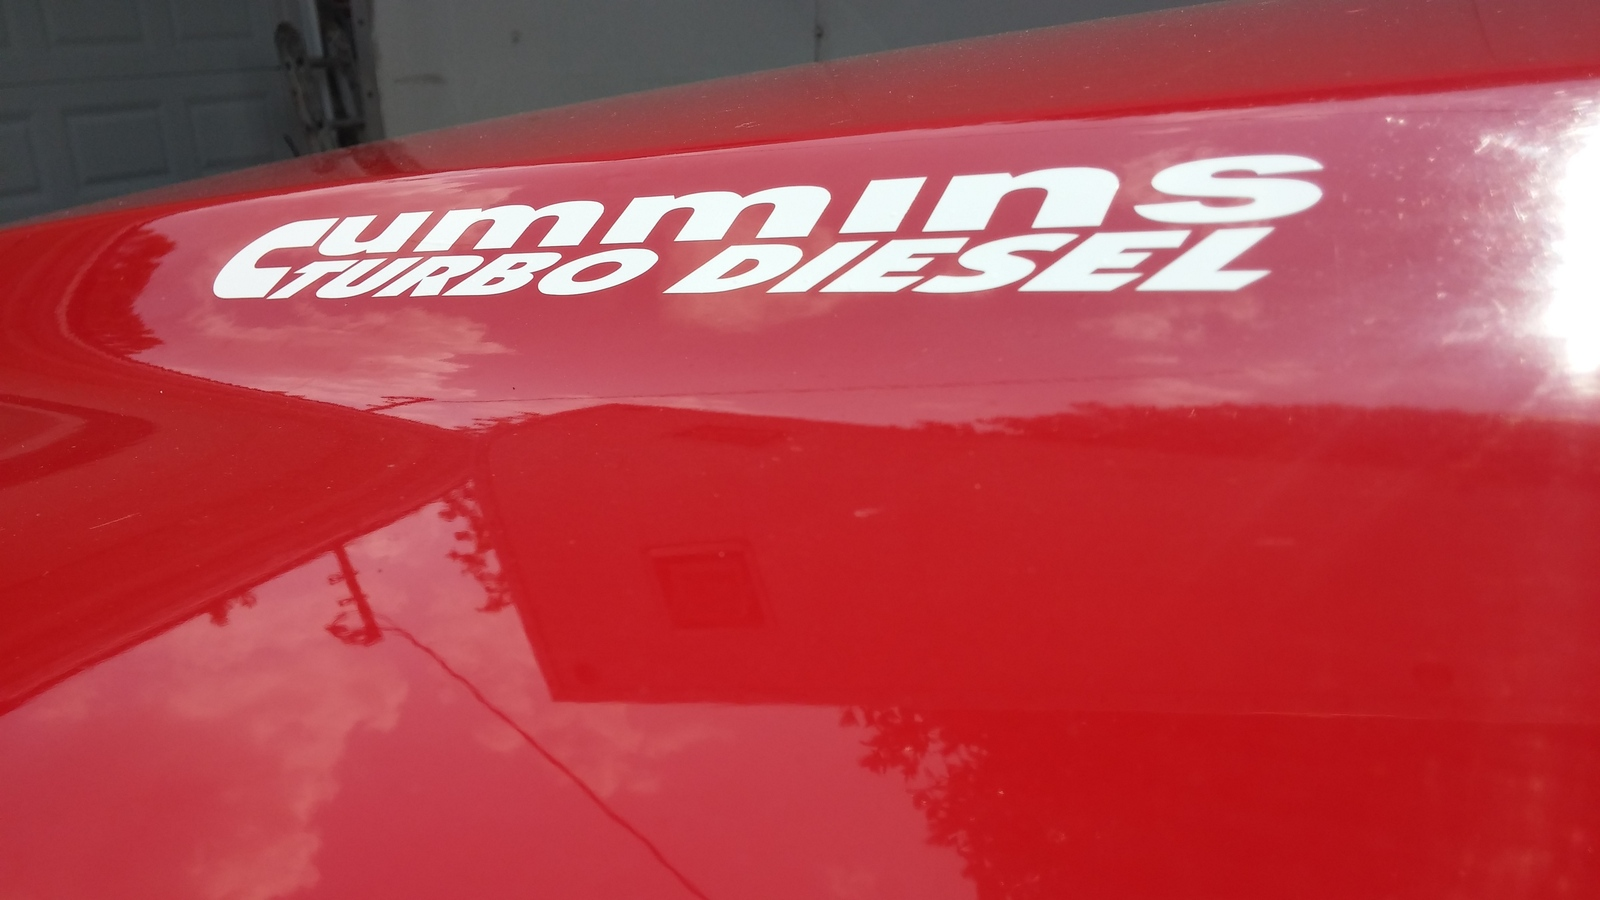 Cummins Turbo Diesel Hood Decals Fits Dodge And 50 Similar Items